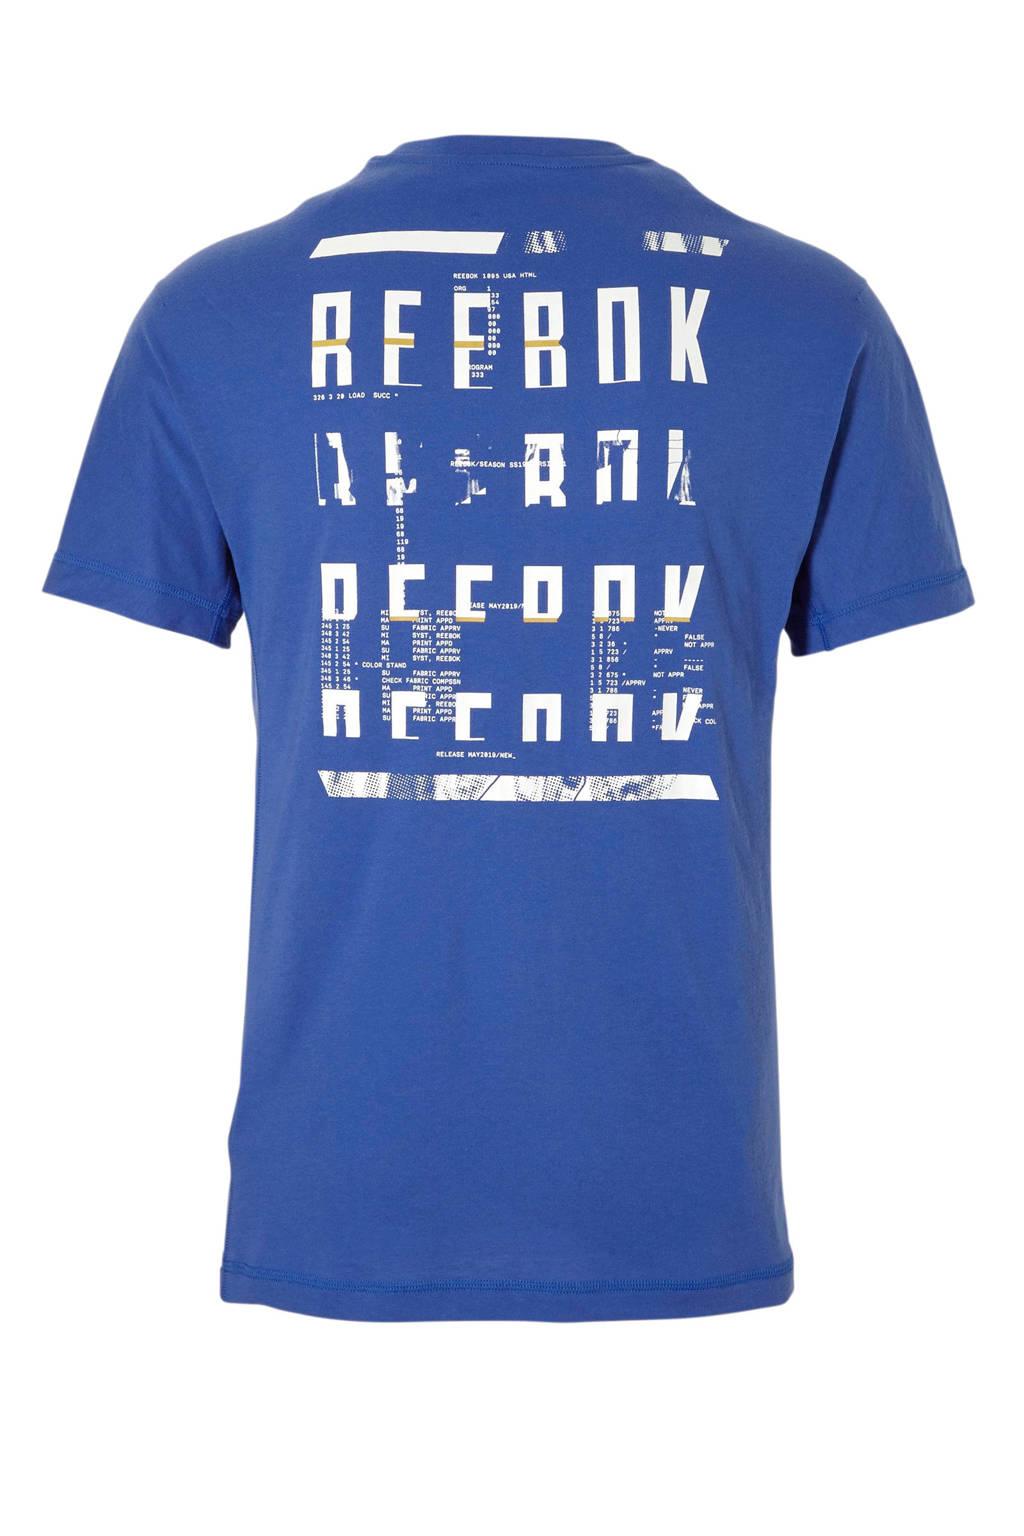 Reebok   sport T-shirt, Blauw